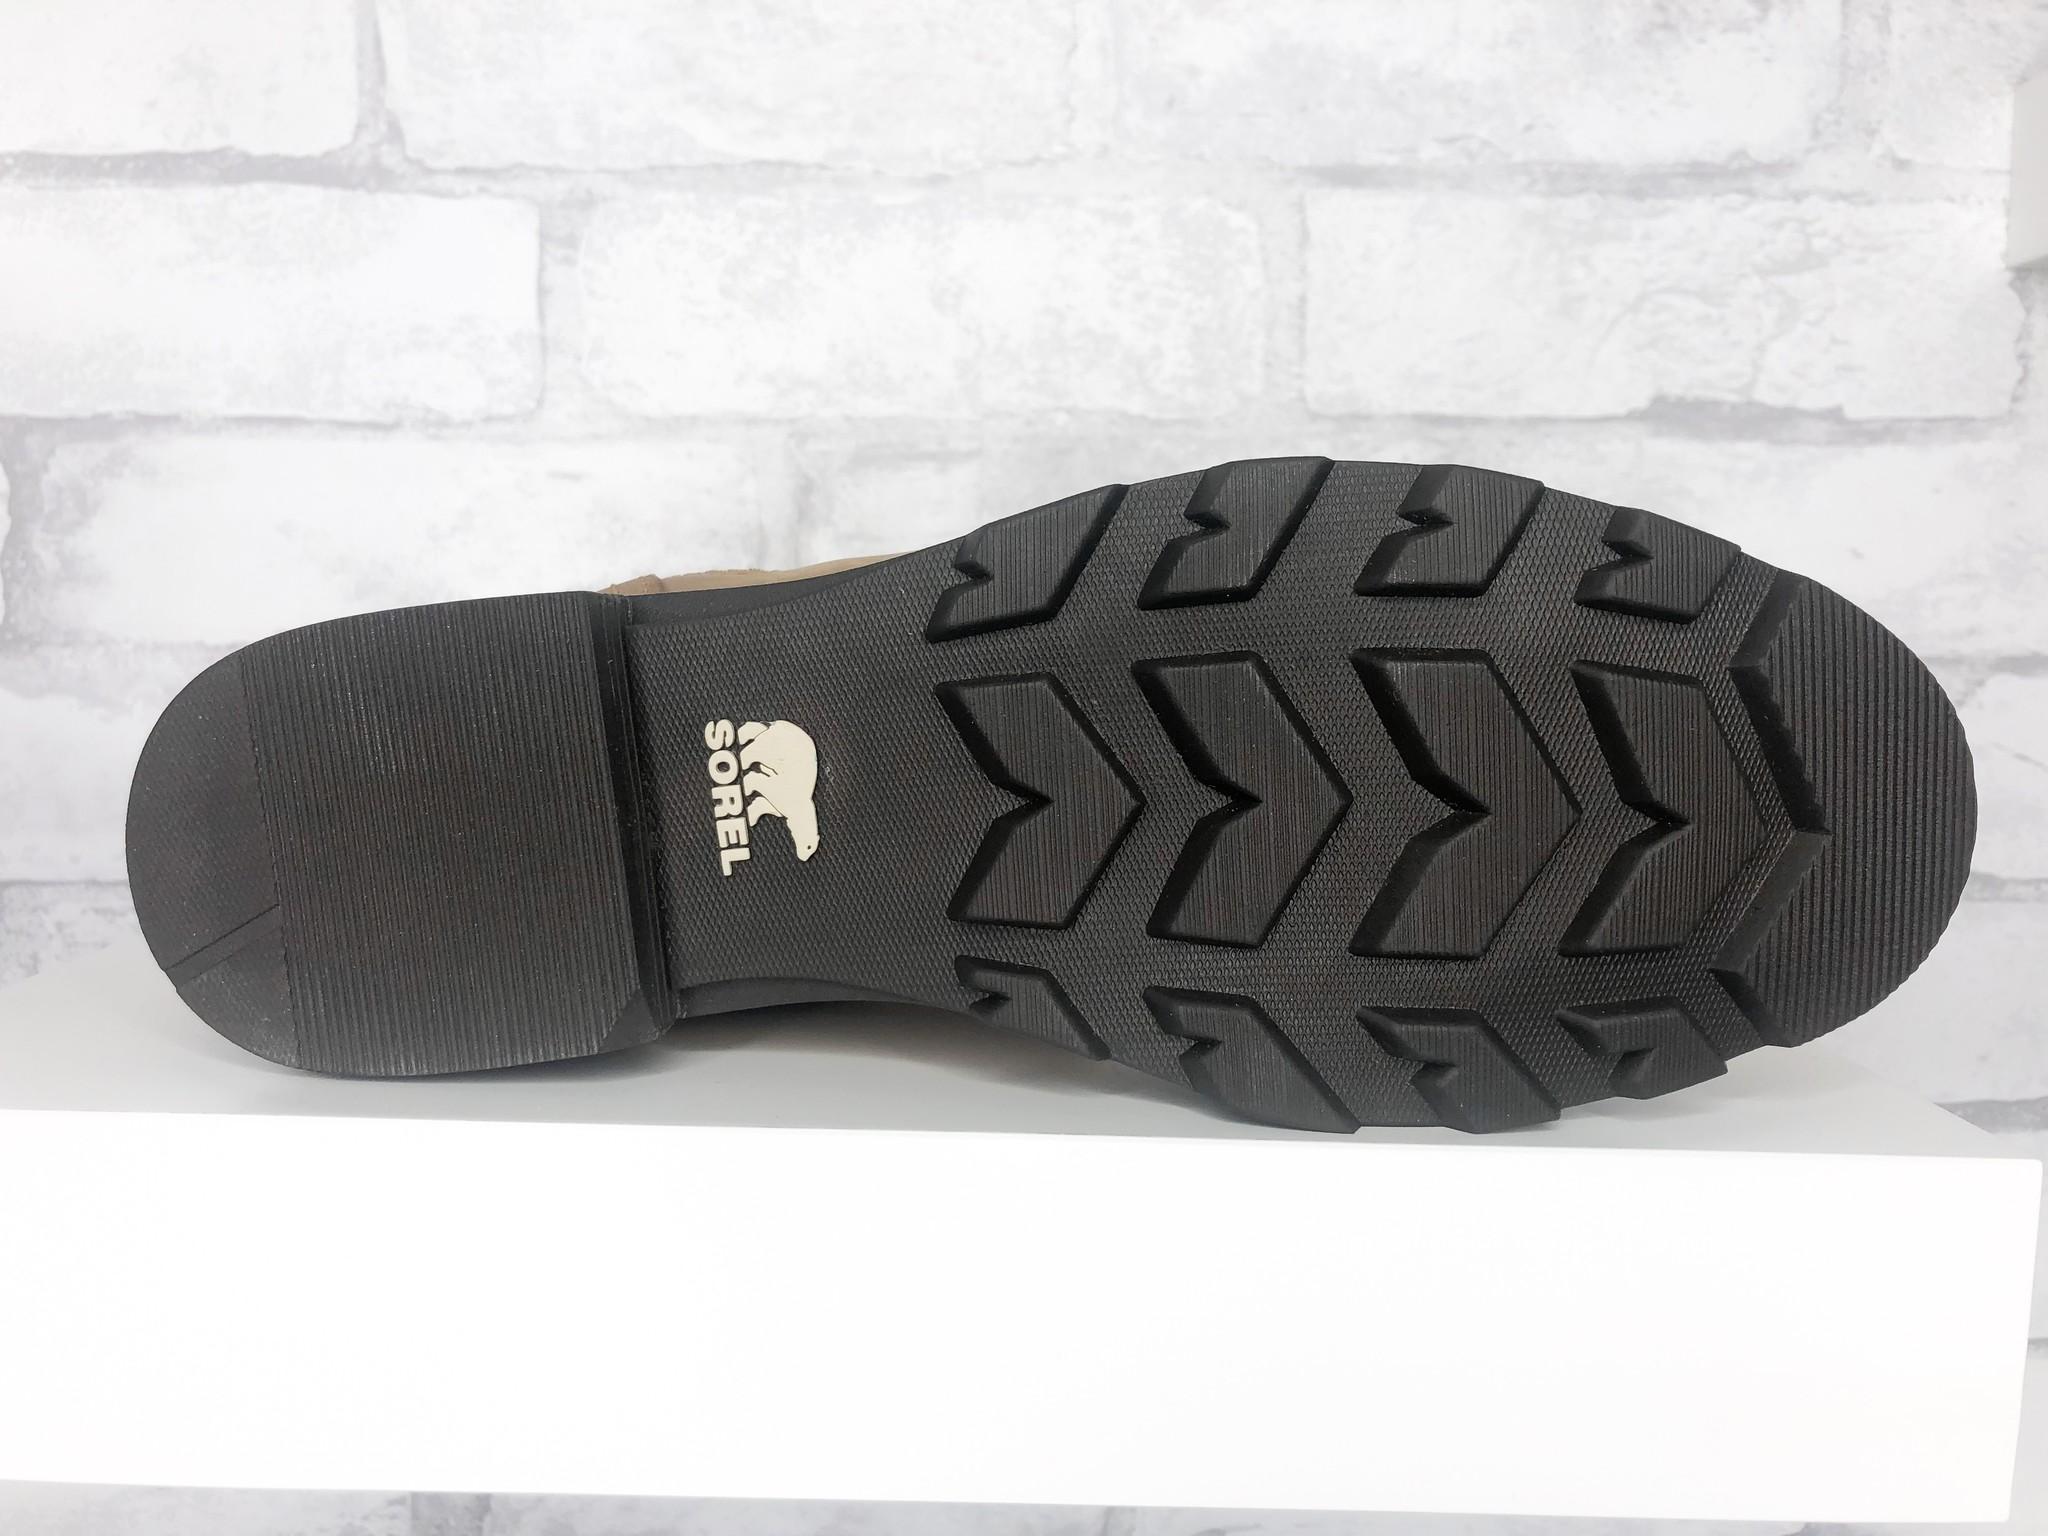 Sorel Footwear Emelie Foldover Camel